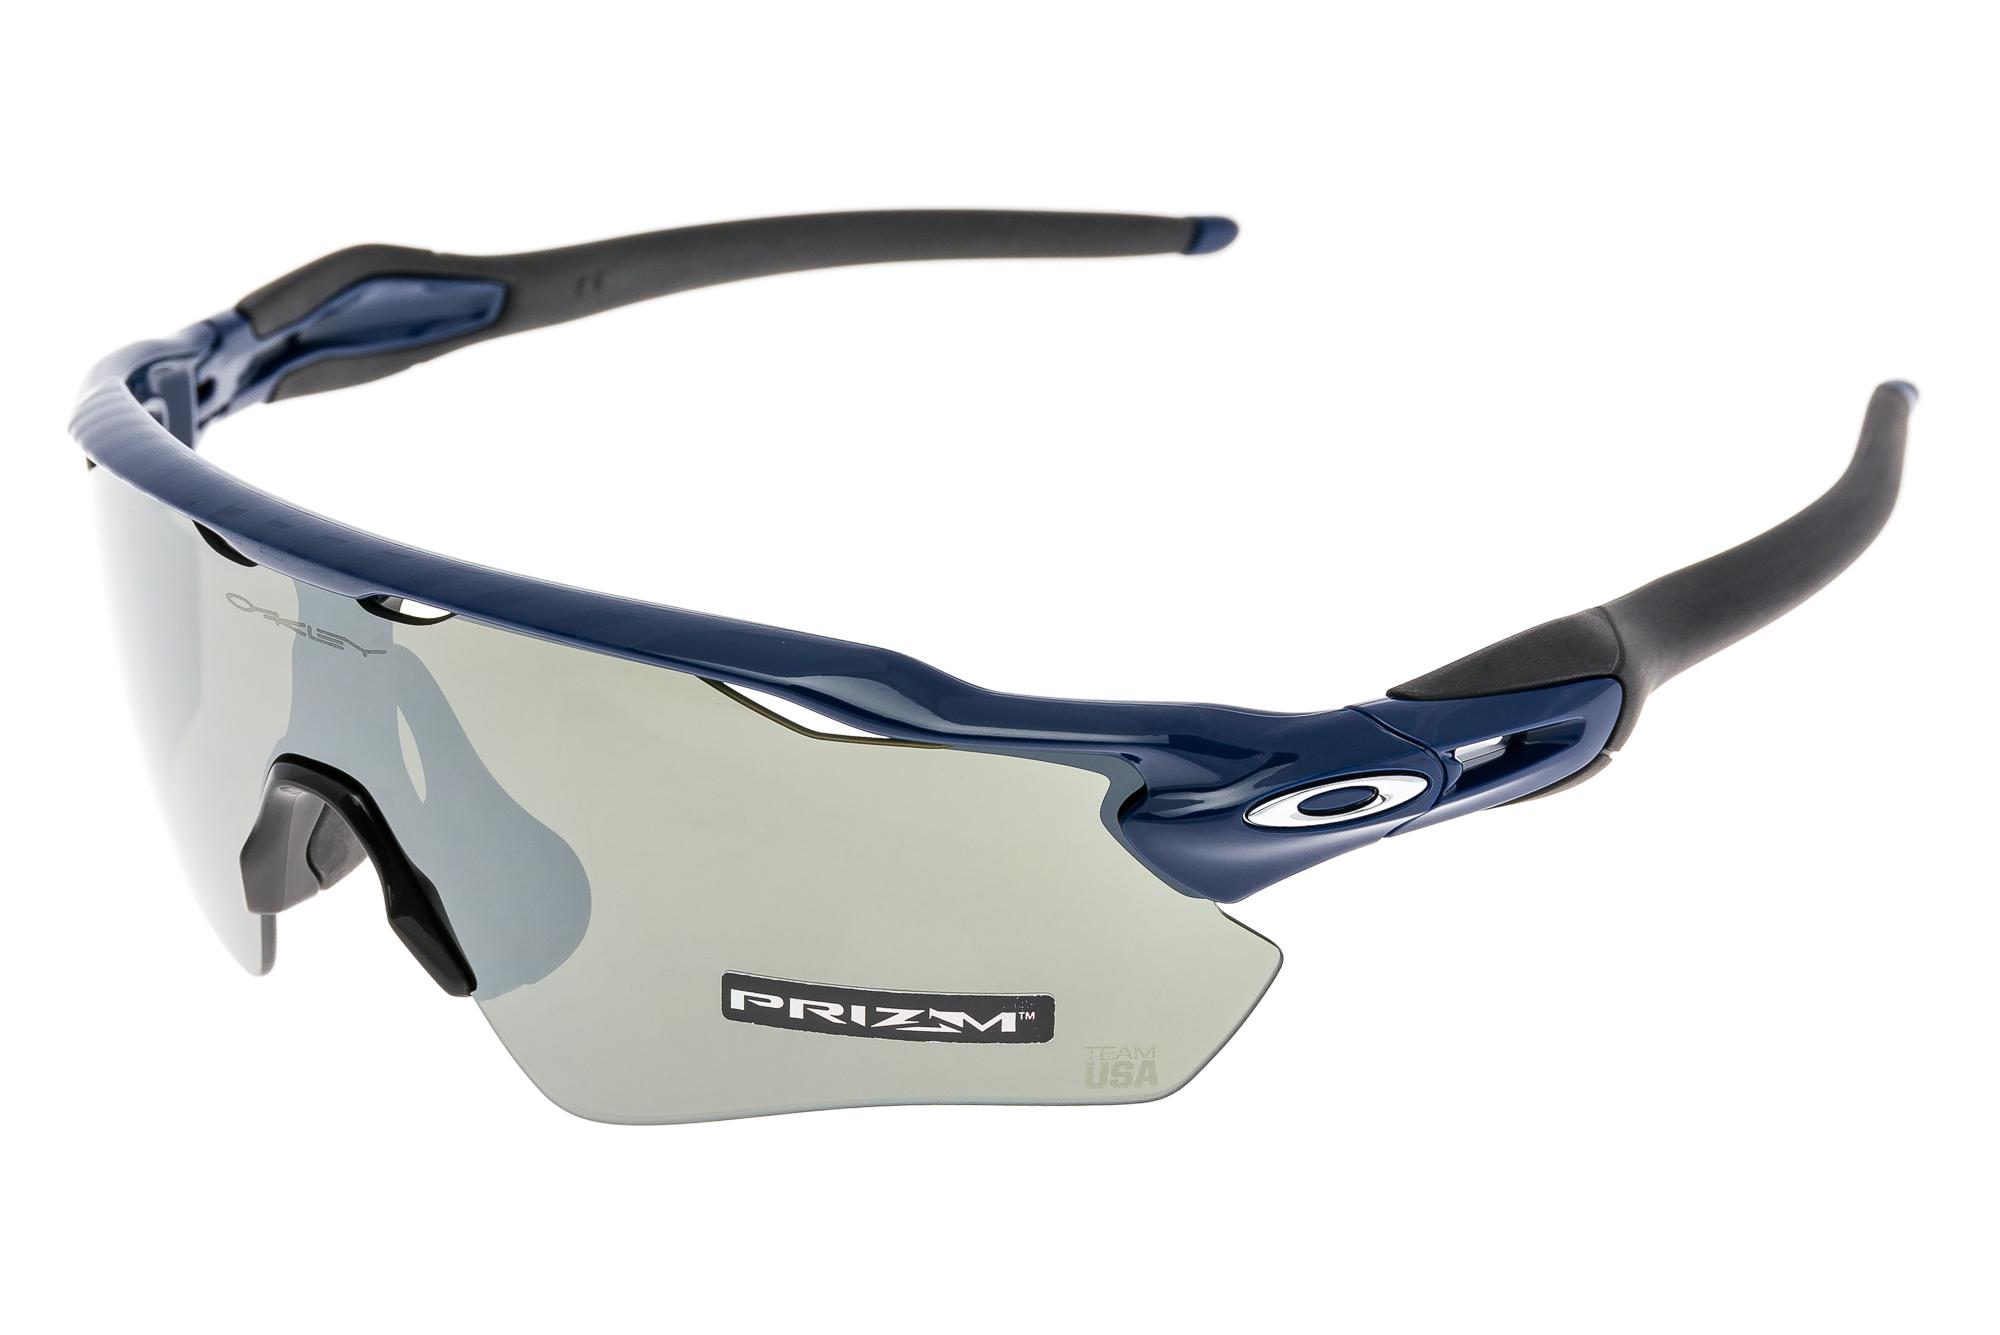 db57835137 Details about Oakley Radar EV Path Team USA Sunglasses Navy Frame Prizm  Black Iridium Lens